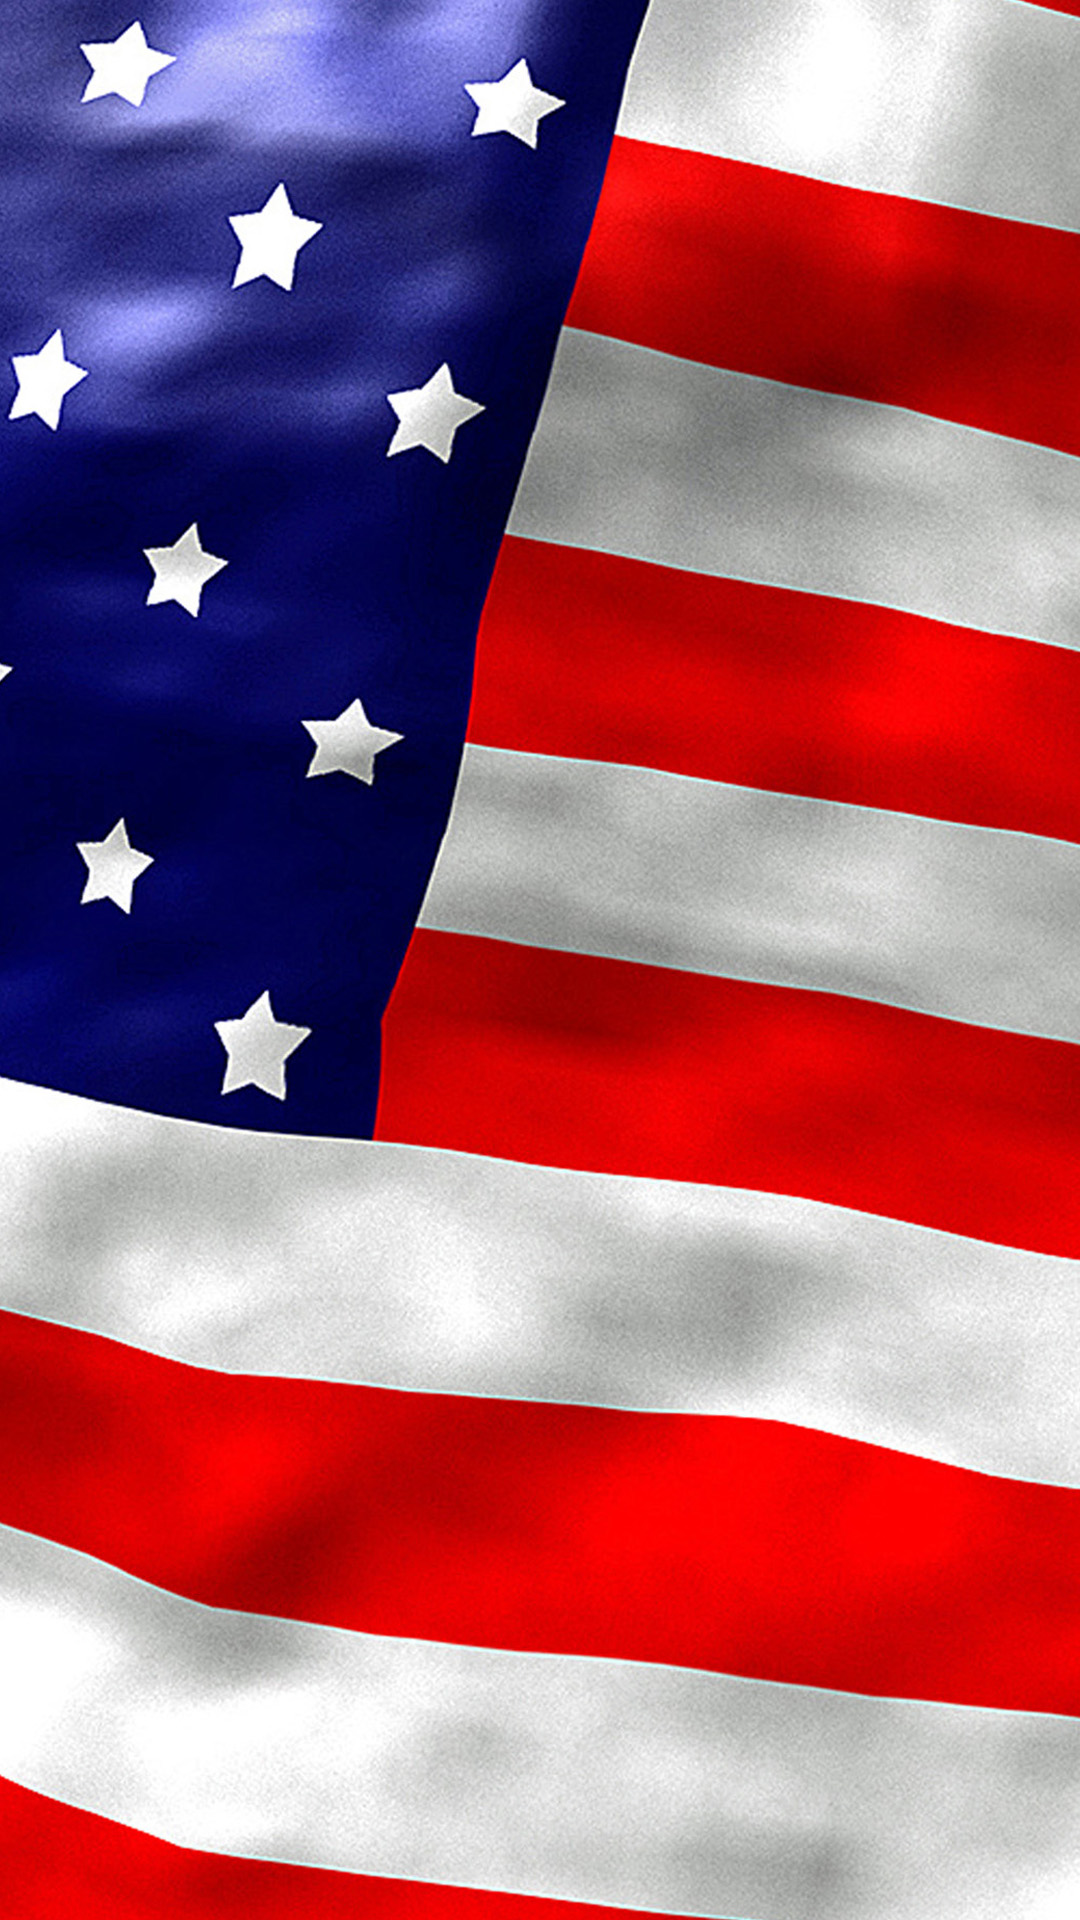 American Flag Hd Iphone Wallpaper American Flag Wallpaper Iphone X 1080x1920 Wallpaper Teahub Io